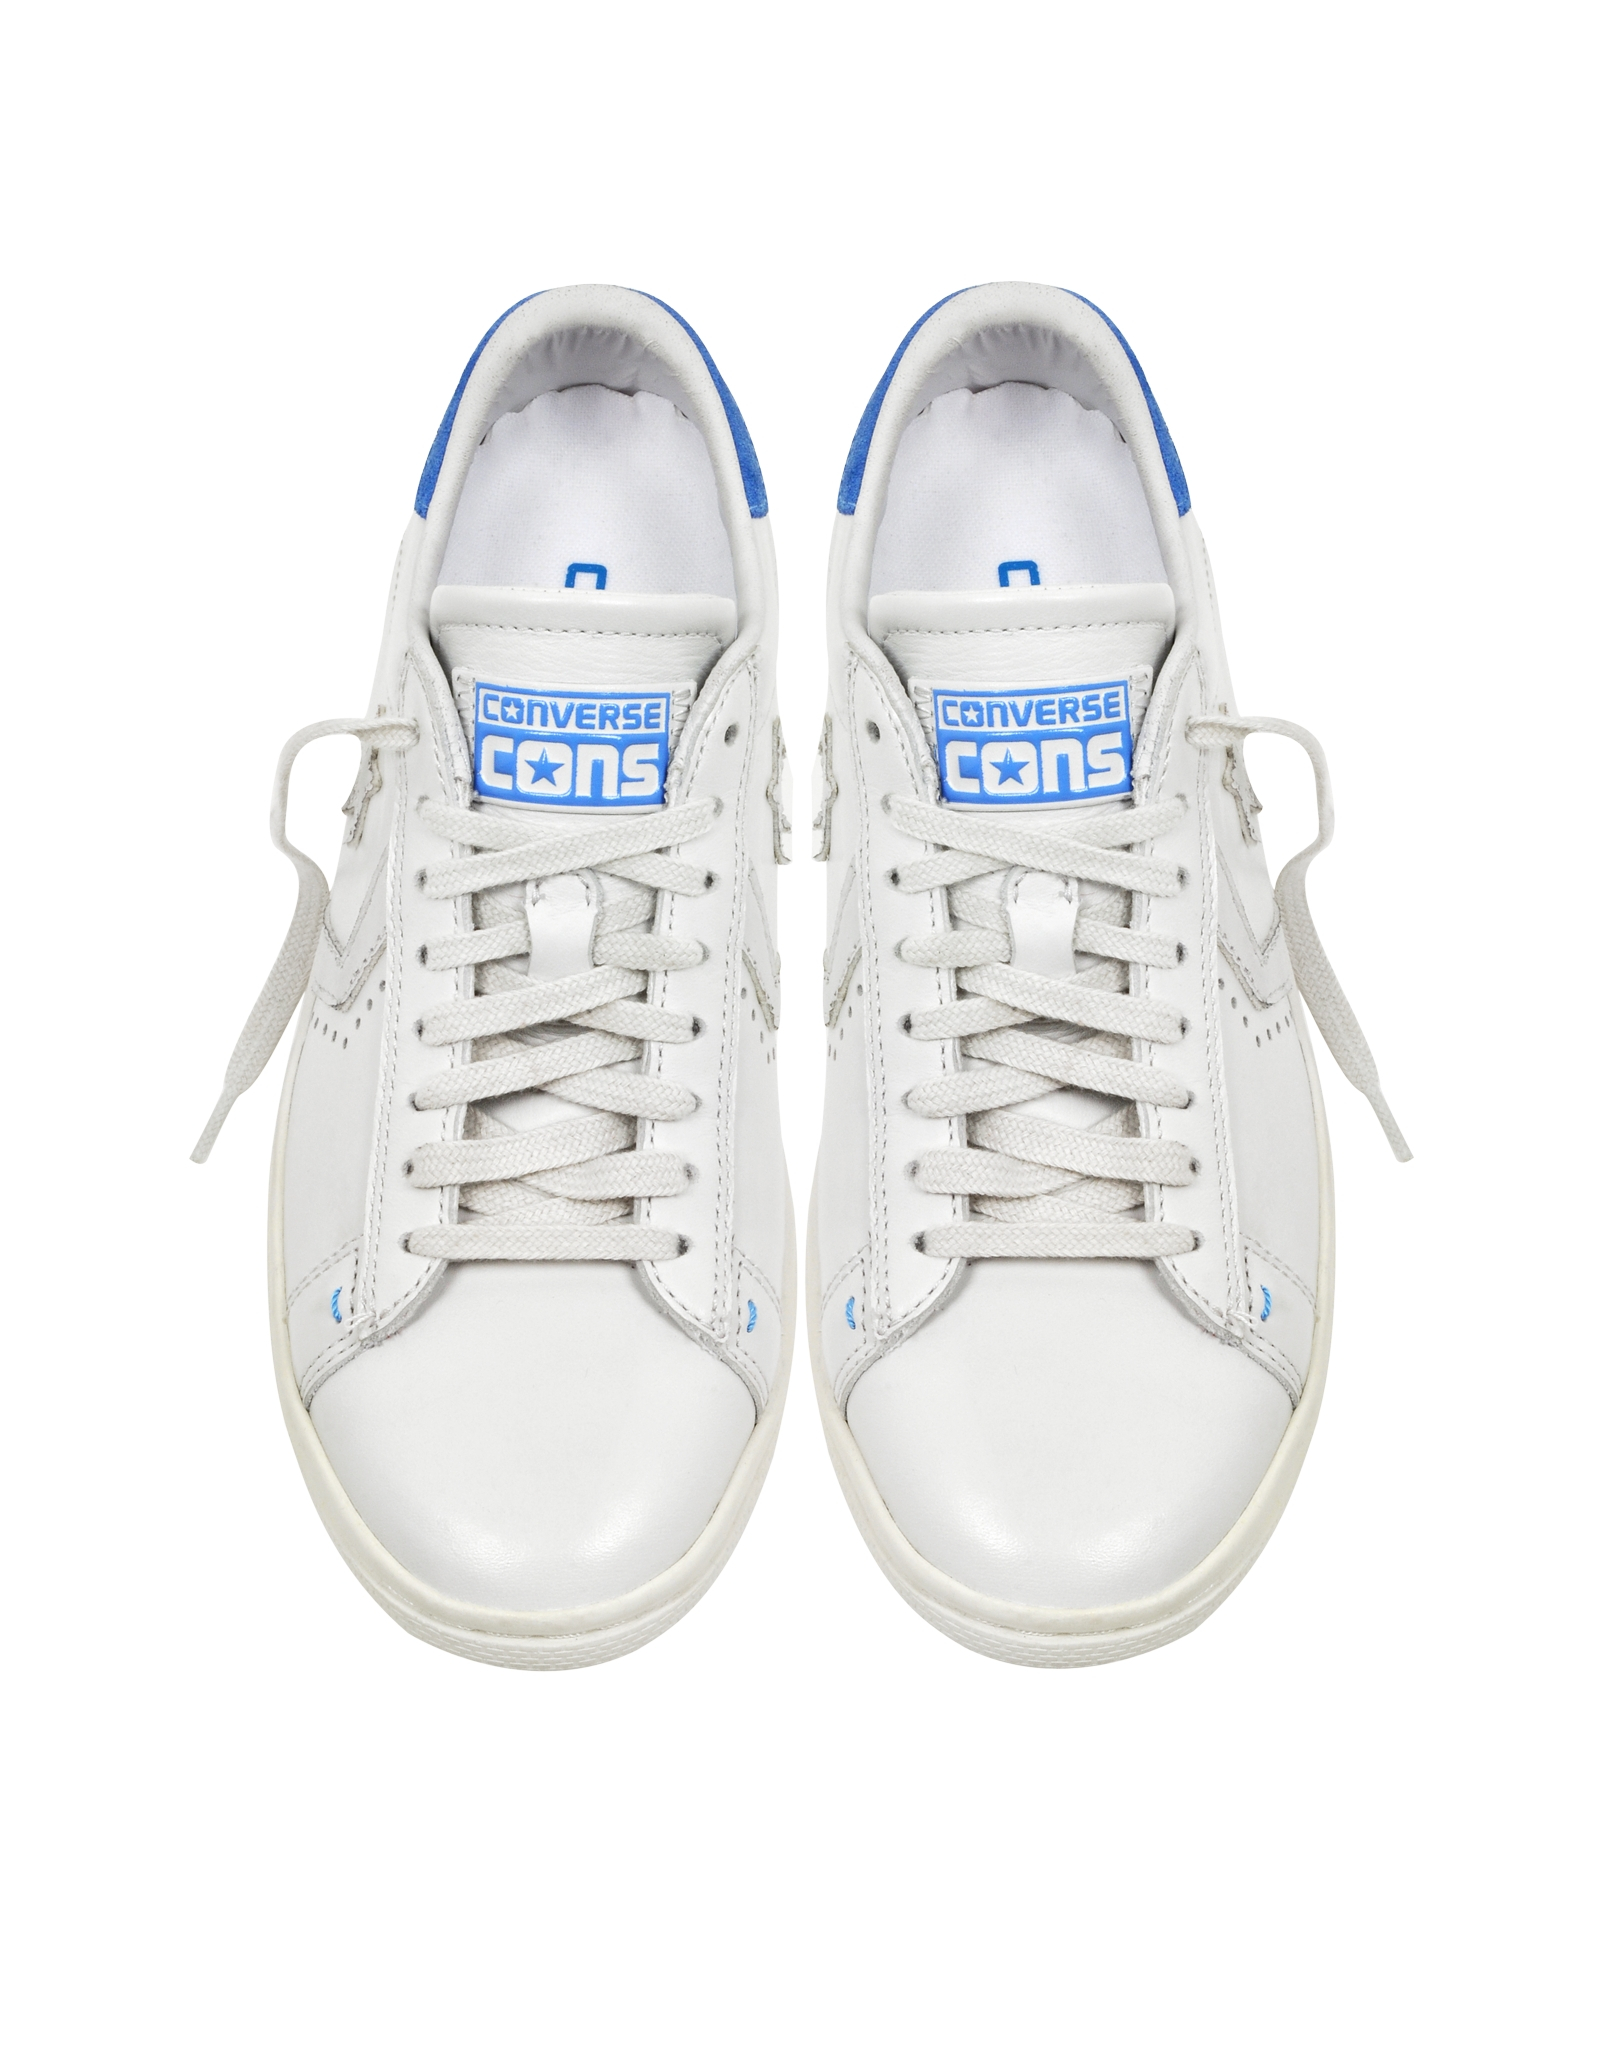 2c534e55e31c Lyst - Converse Cons Pro Leather Lp Ox White Dust And Light Blue ...